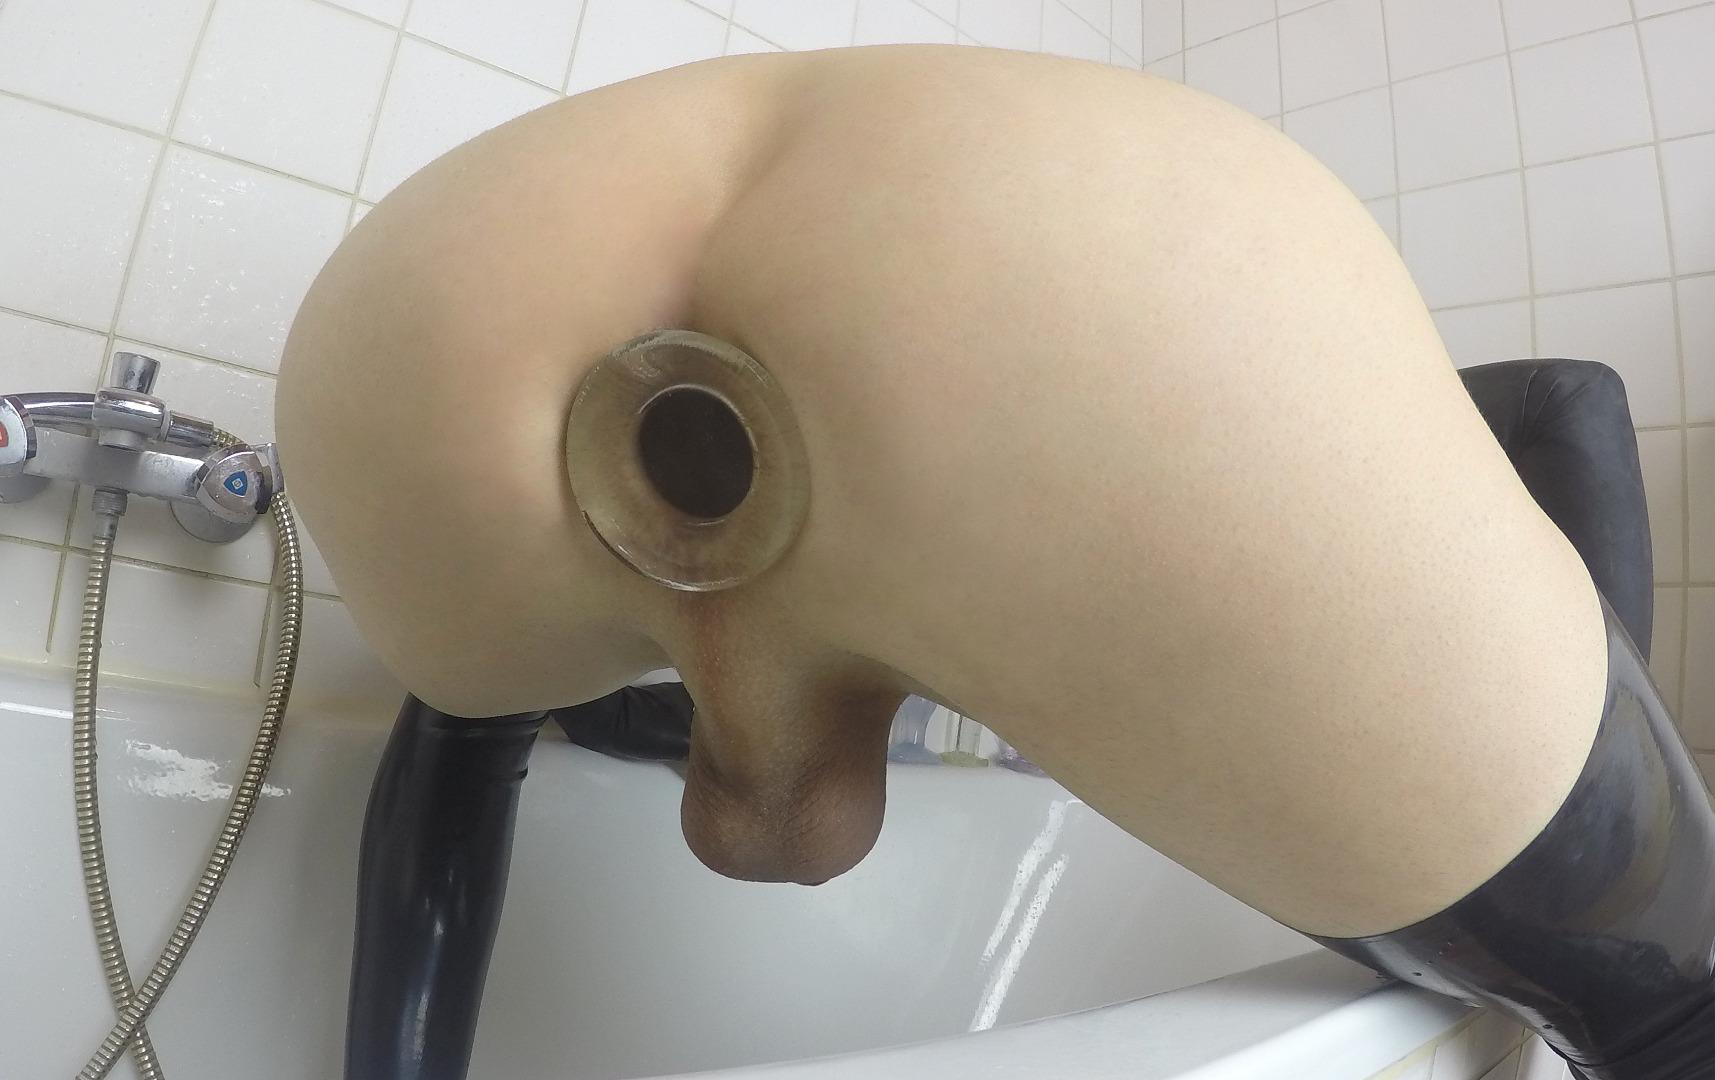 karla kush videos and porn movies tube #gay #twink #femboi #sissyboy #faggot #gayboy #twinks #buttplug #plugged #assplug #plugs #amateur #homemade #sissy #ts #stuffed #asshole #tv